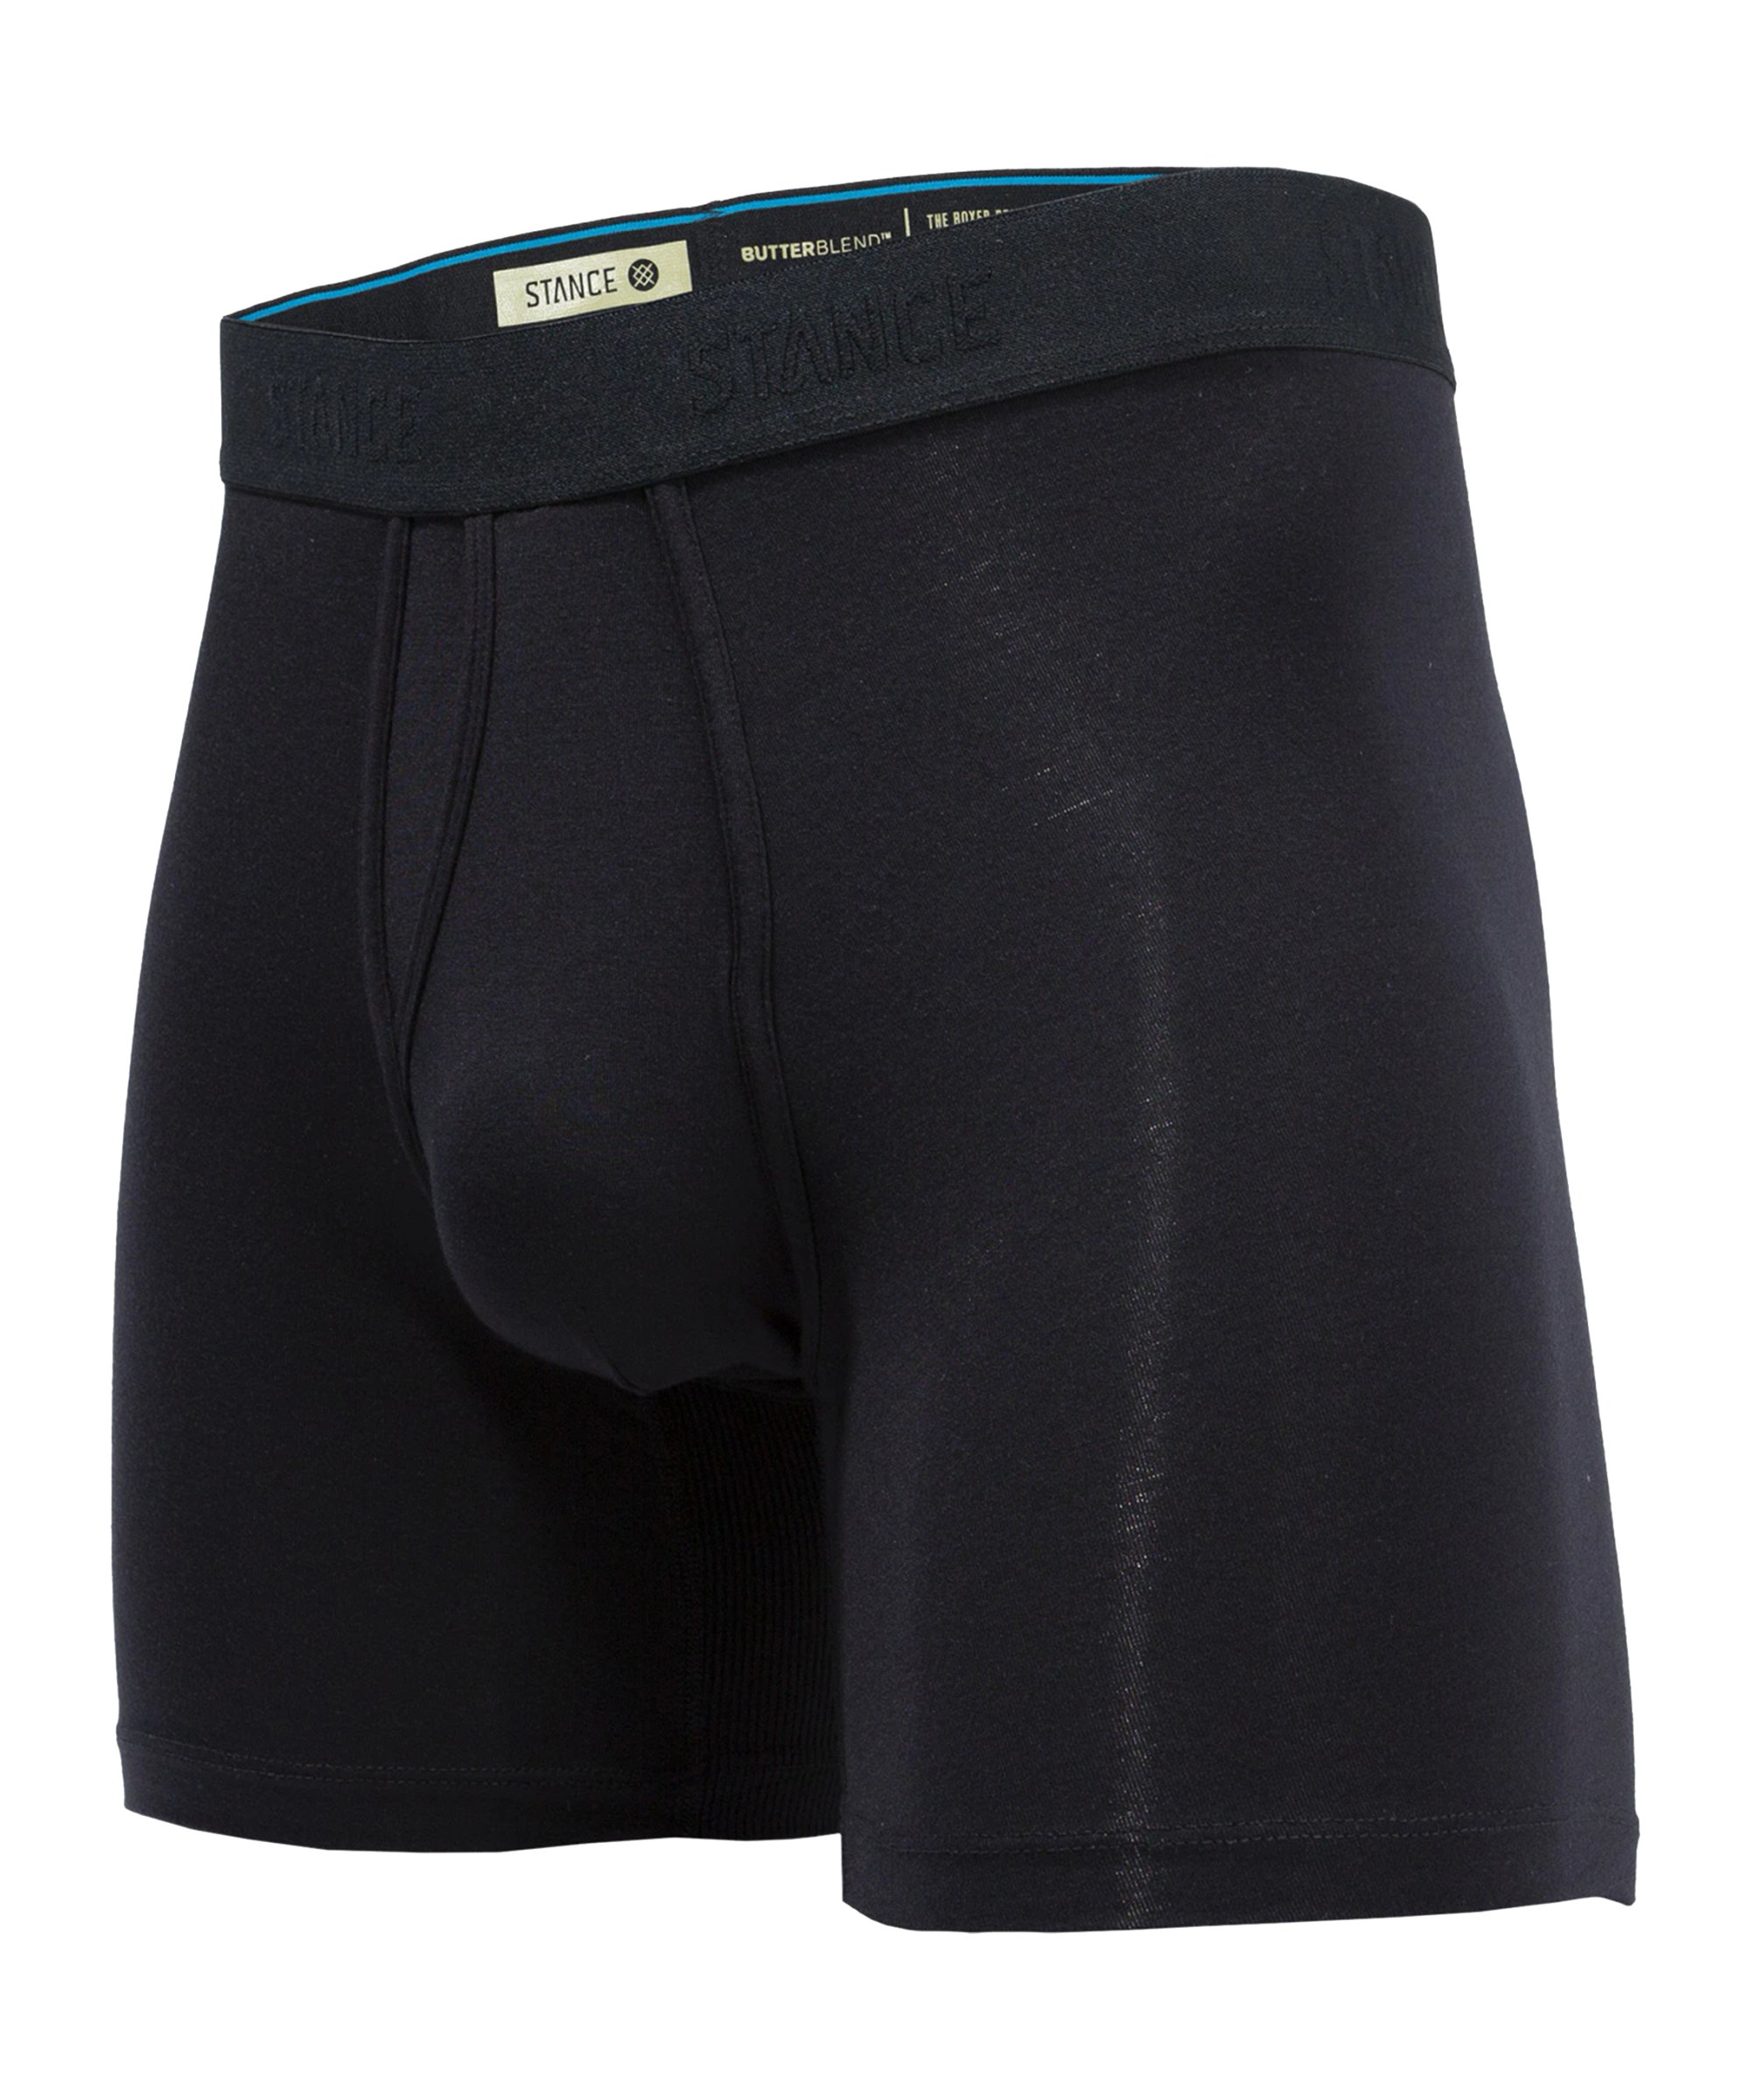 Stance Standard Brief Boxershort 2er Pack FBLK - schwarz